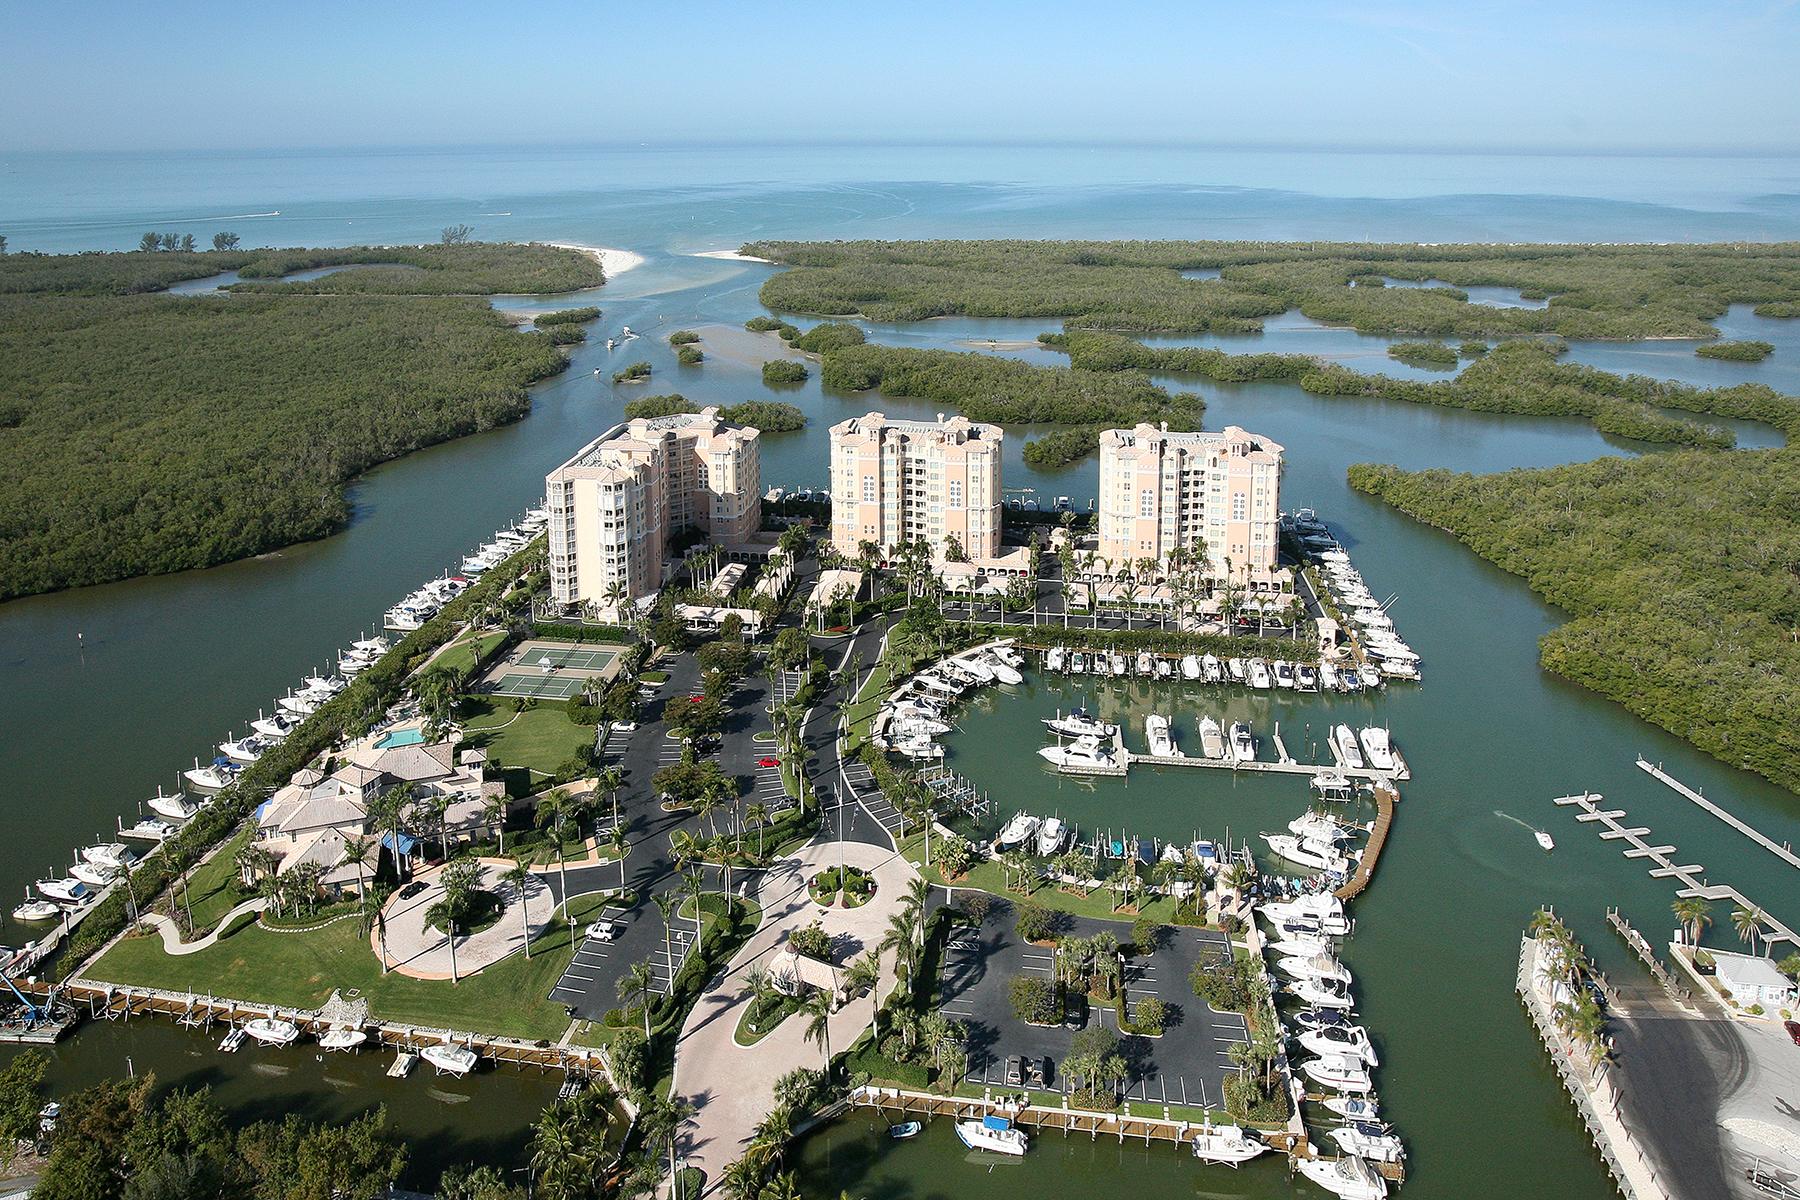 Condomínio para Venda às PELICAN ISLE - RESIDENCES 445 Dockside Dr 802 Naples, Florida 34110 Estados Unidos